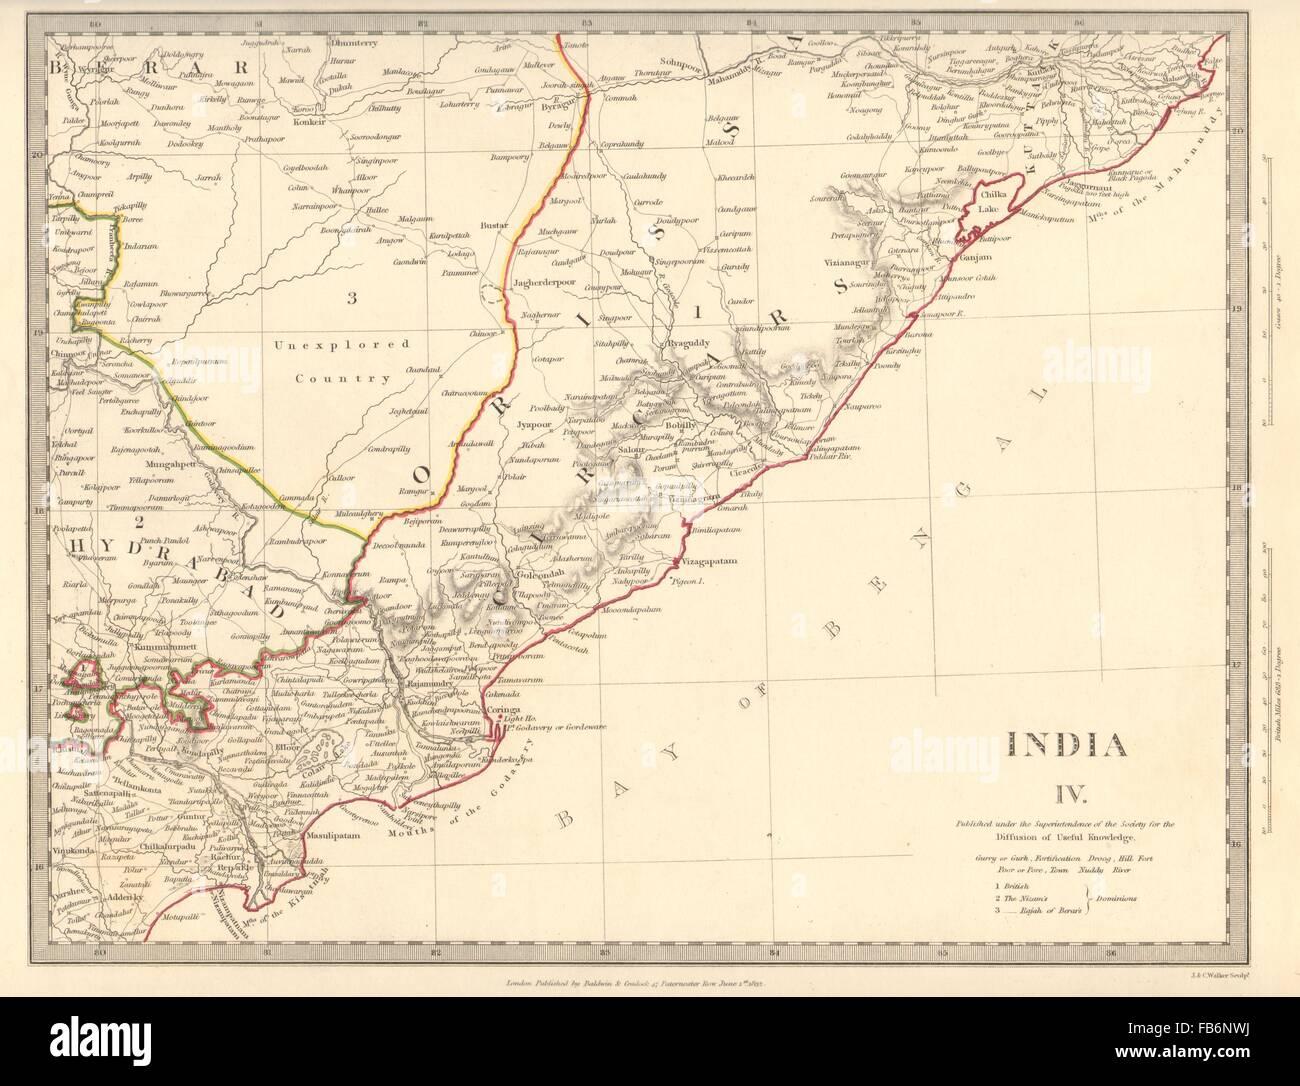 Hyderabad India Map Stock Photos Hyderabad India Map Stock Images